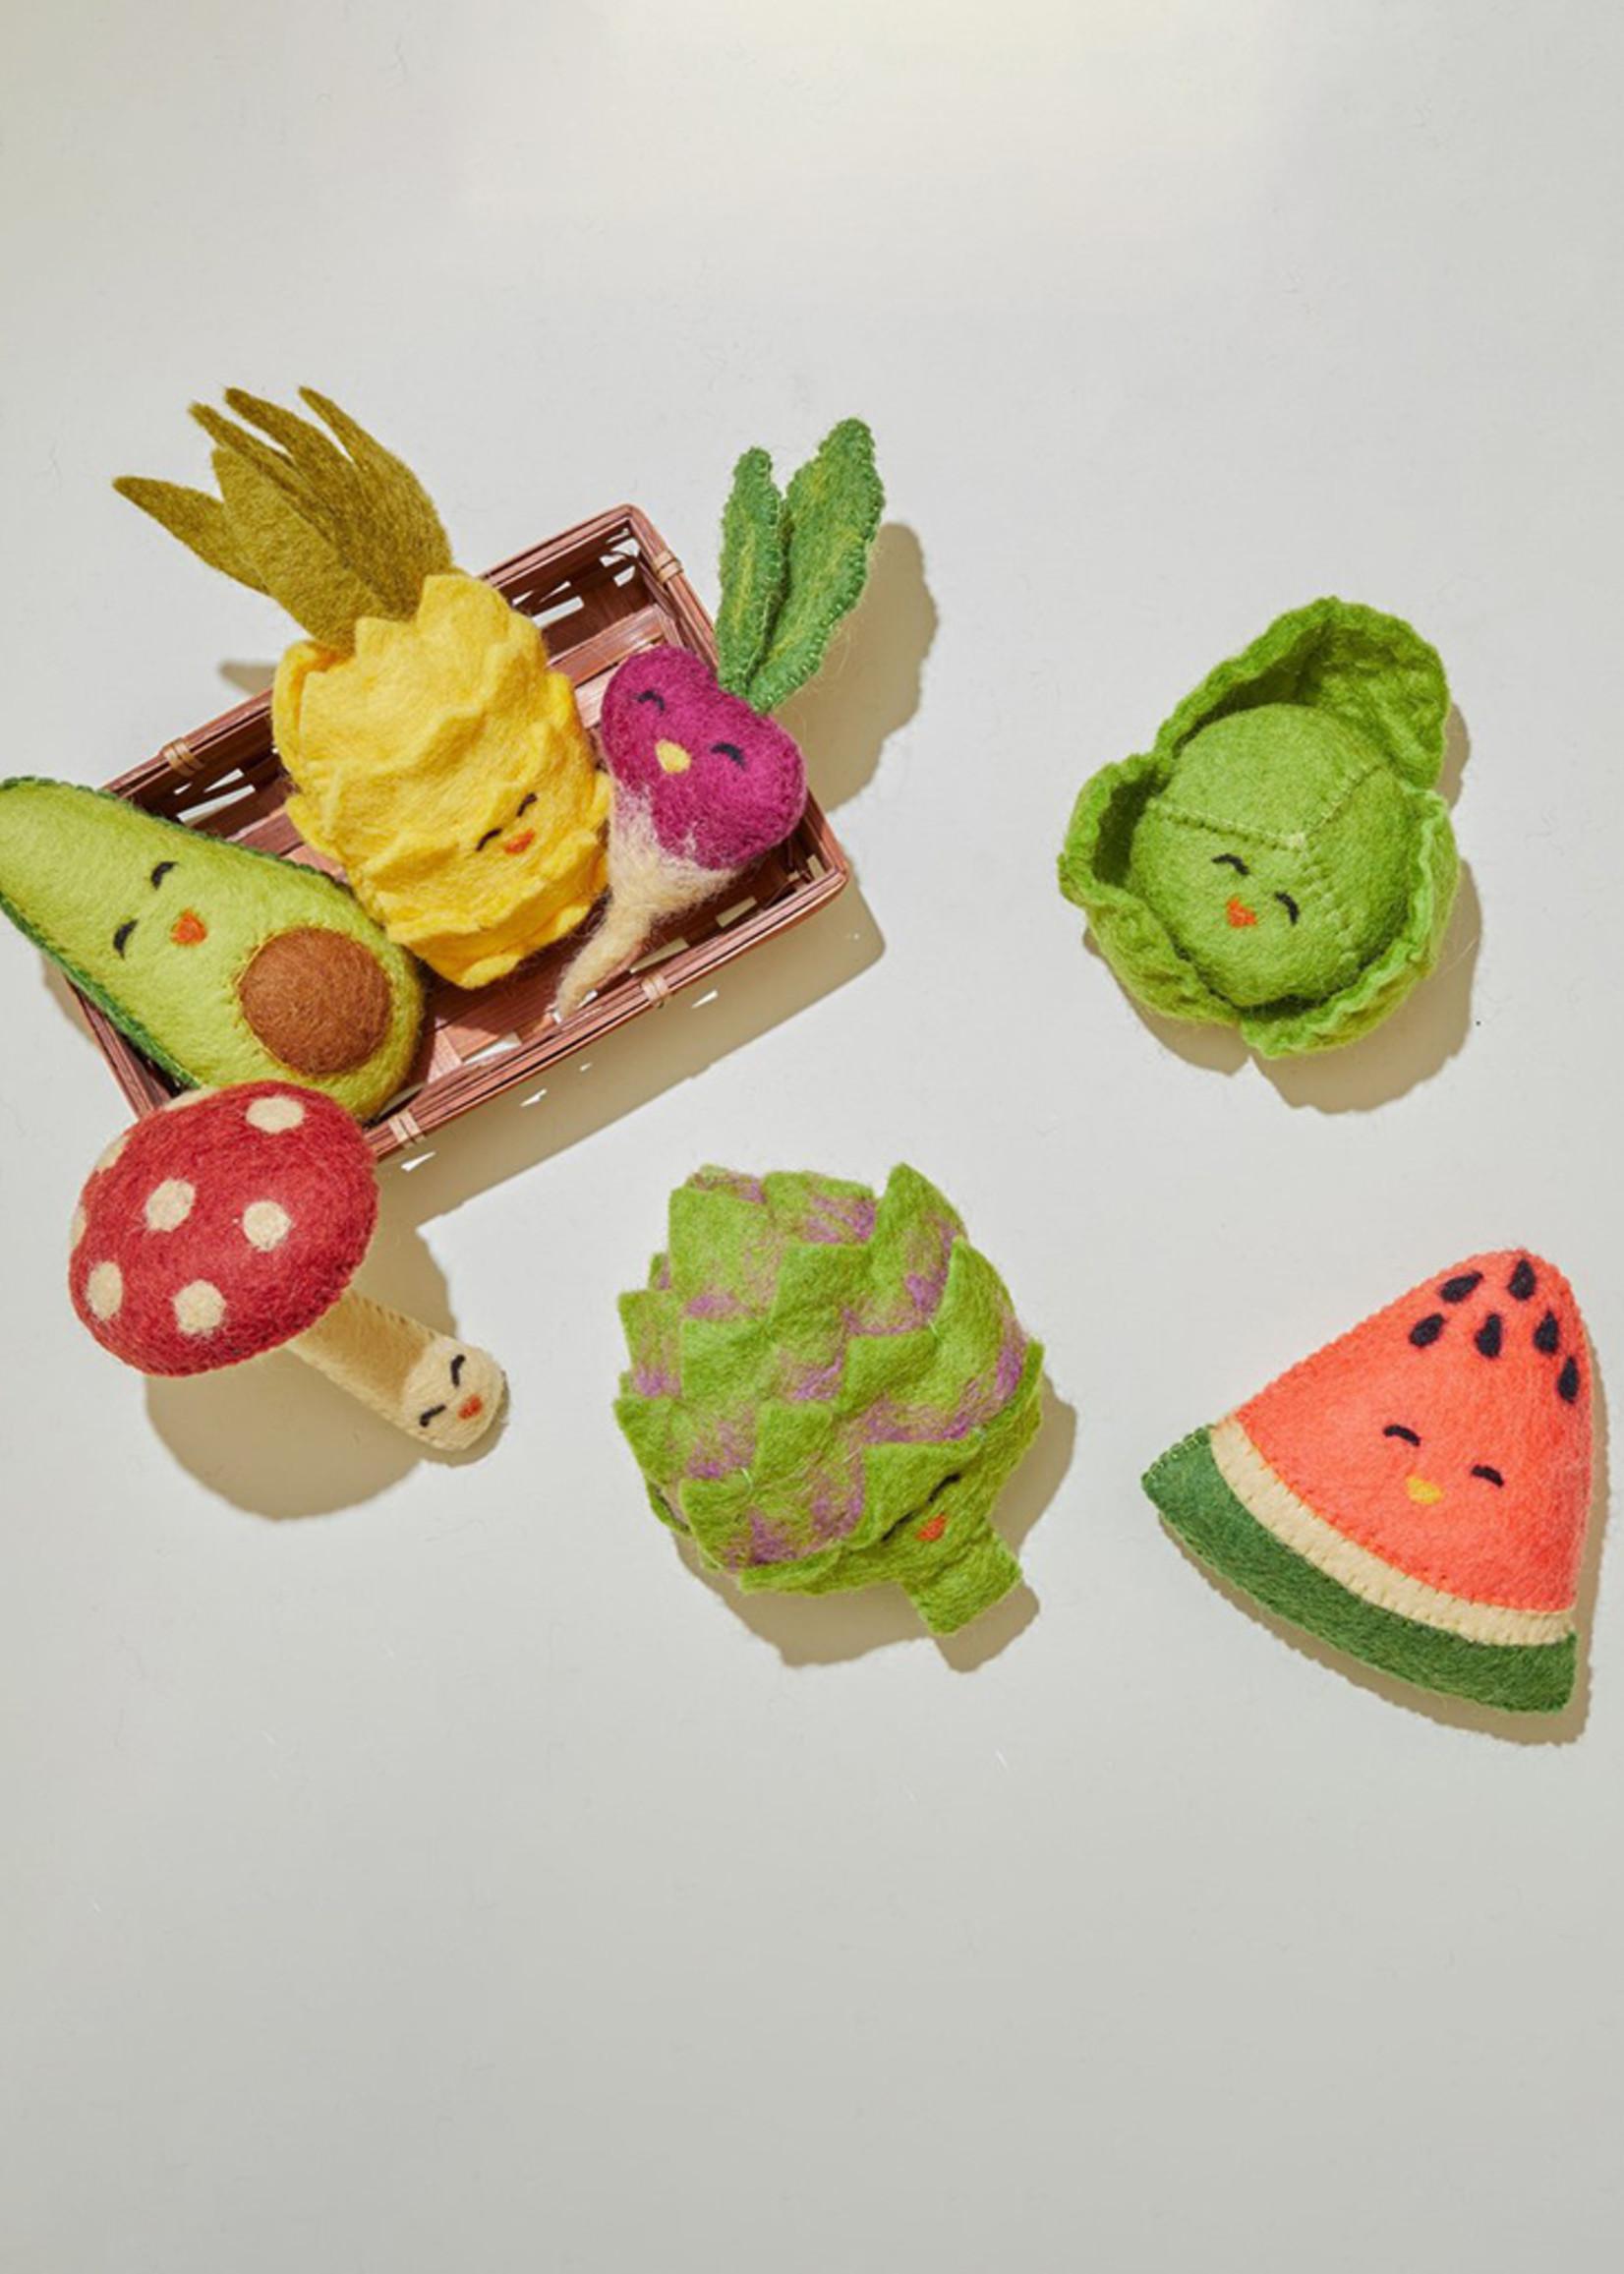 Global Goods Partners Felt Pineapple Toy